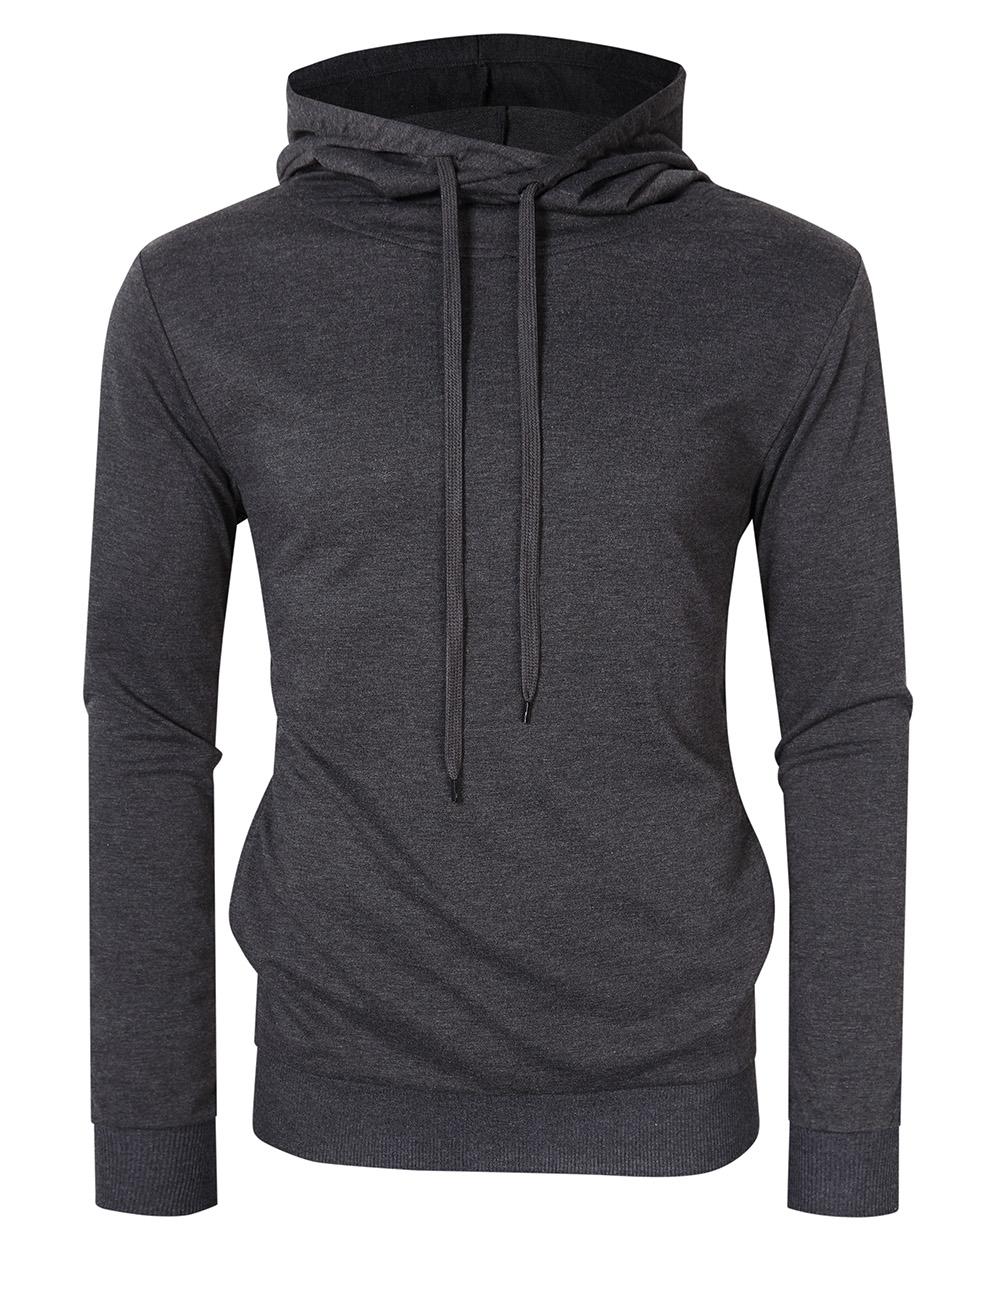 [US Direct] Yong Horse Men's Long Sleeve Pullover Hoodie Lightweight Hooded Sweatshirt Gray_2XL